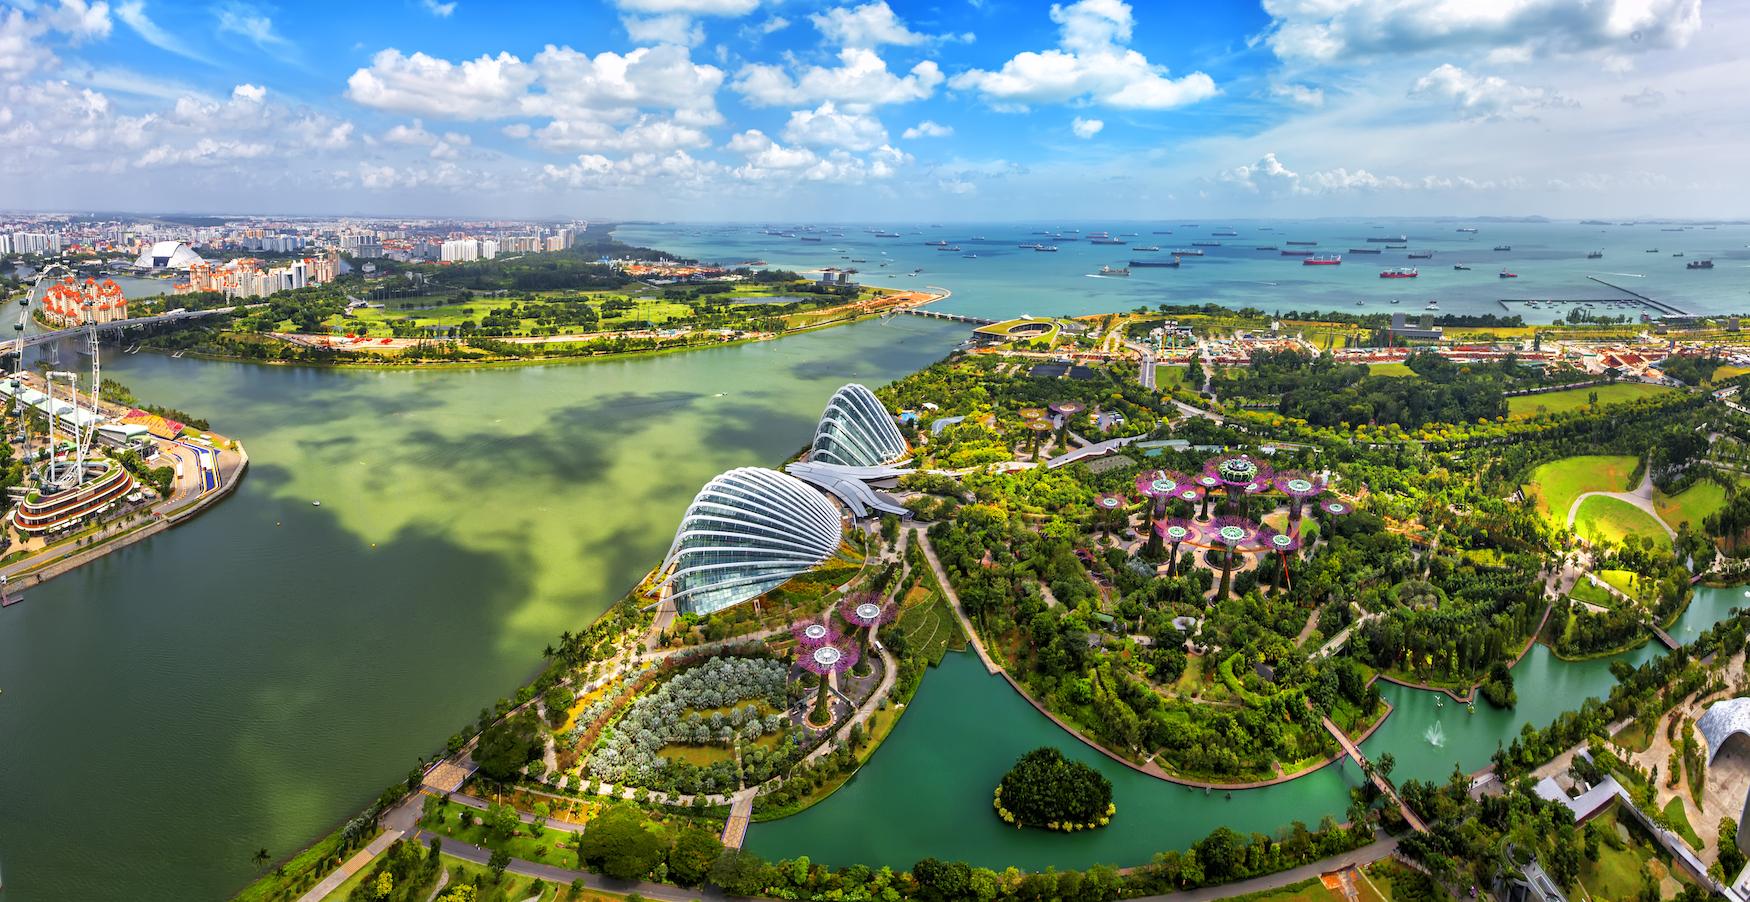 singapoure_756788173.jpg